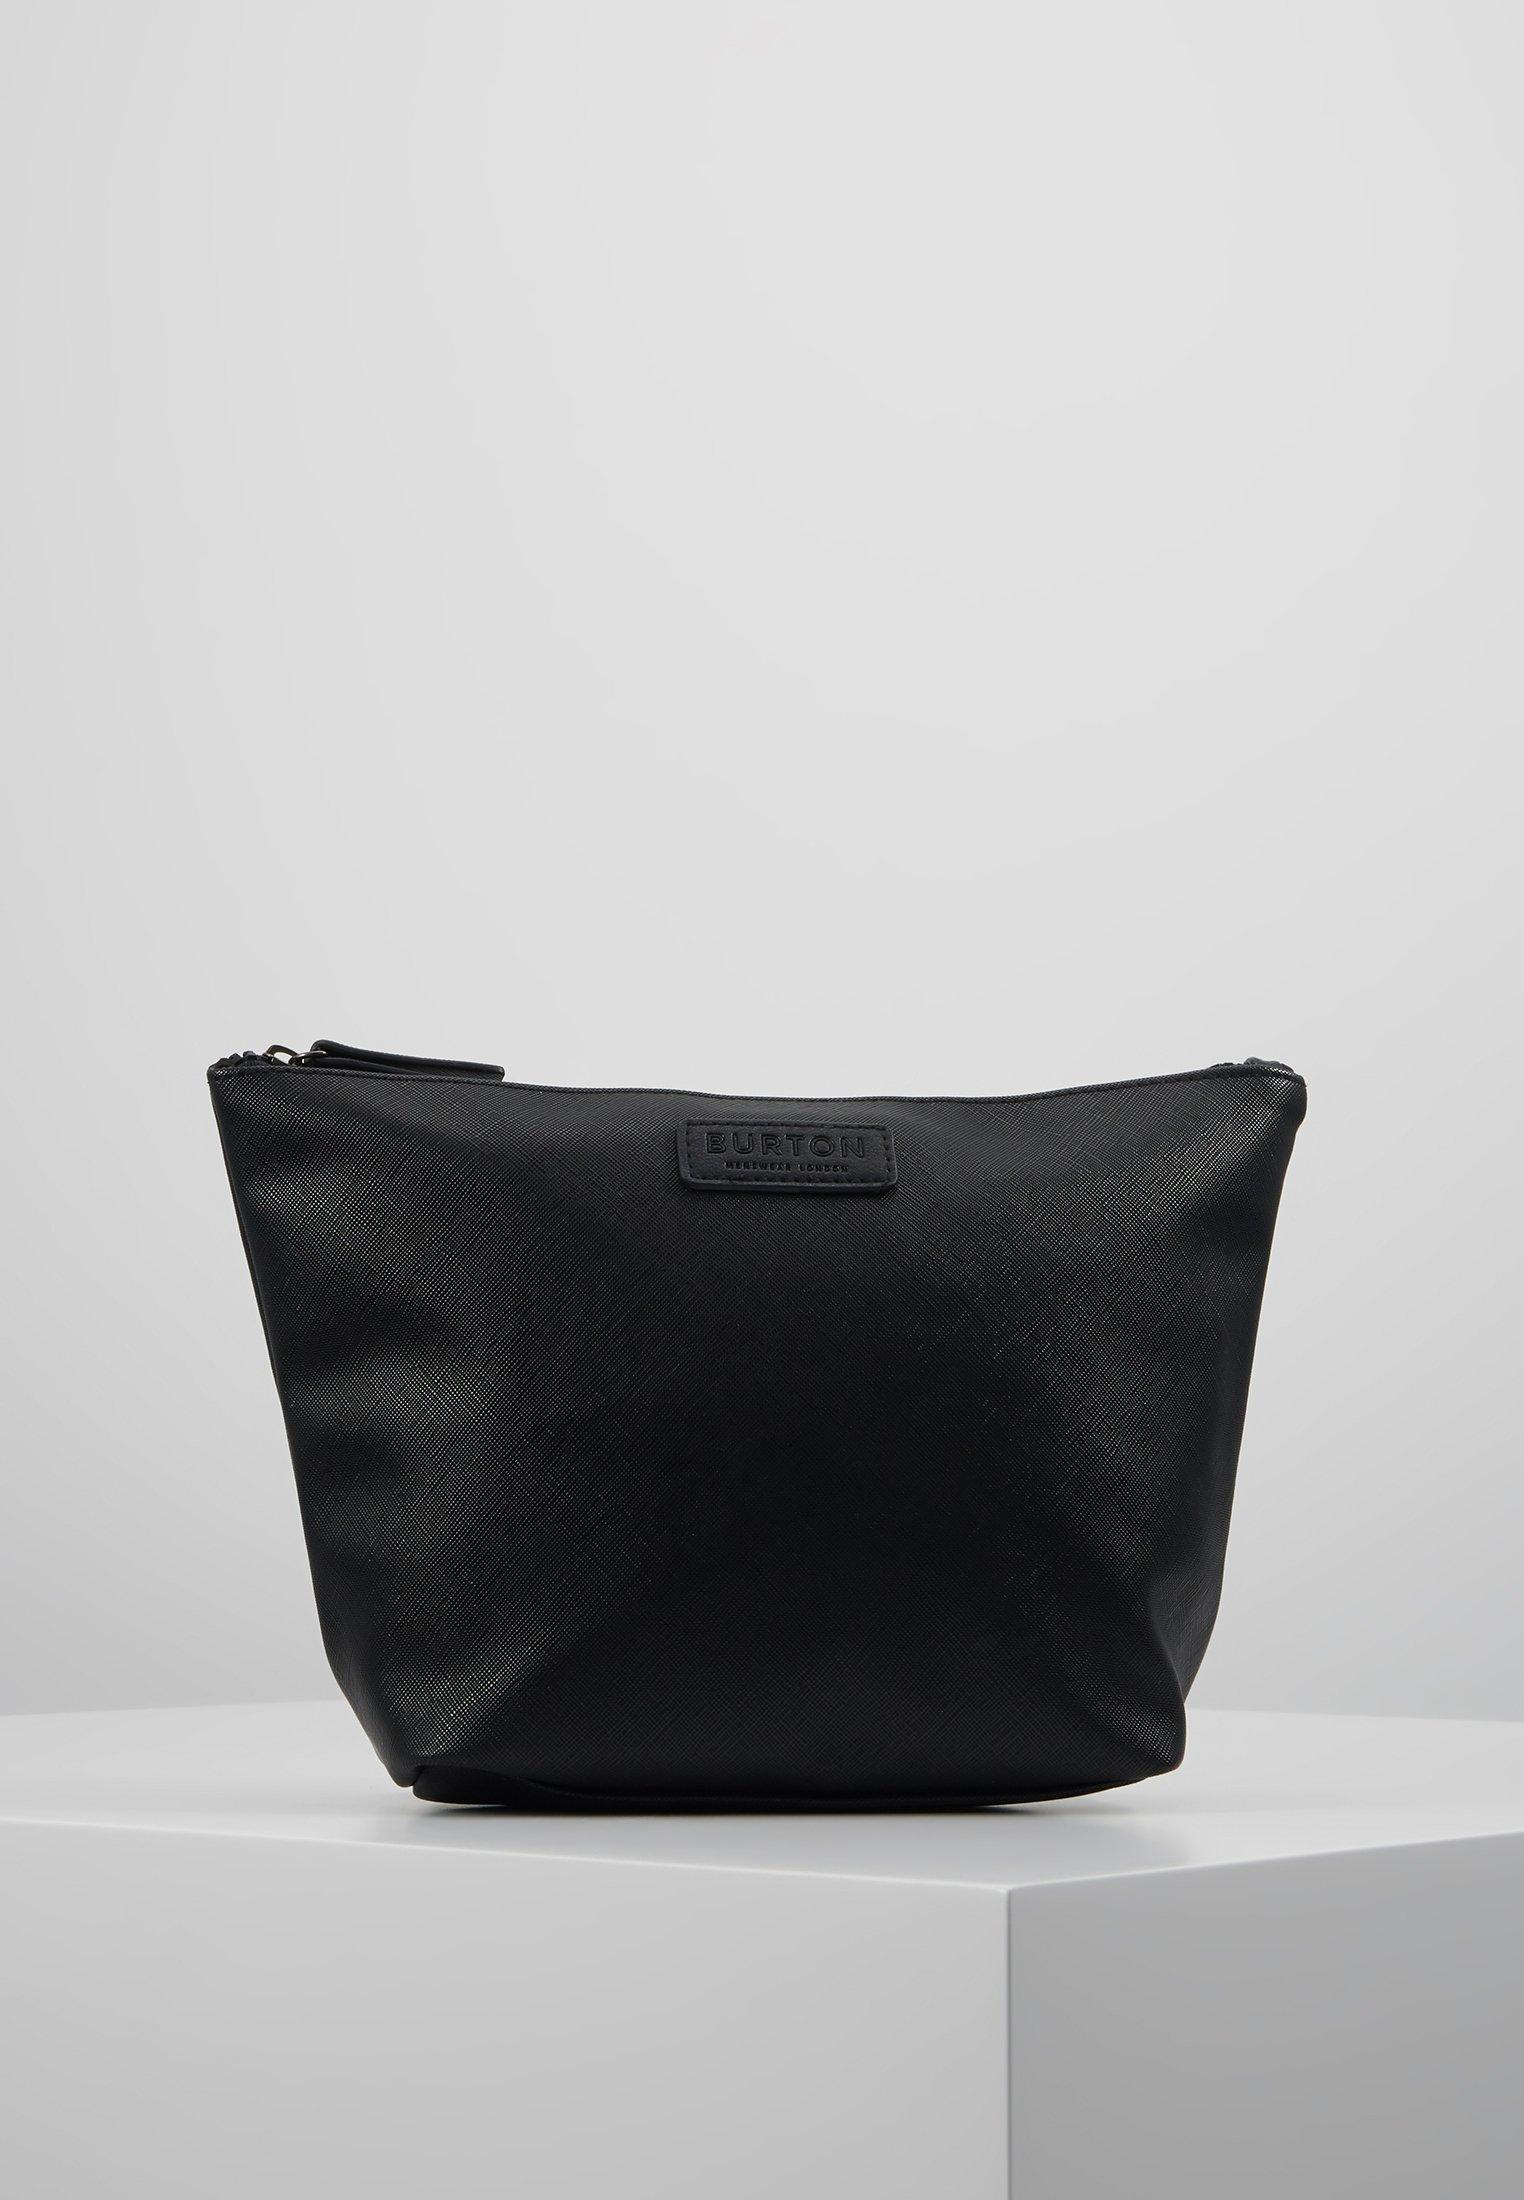 Menswear Burton Black Saffiano WashbTrousse London sQrCthBxd